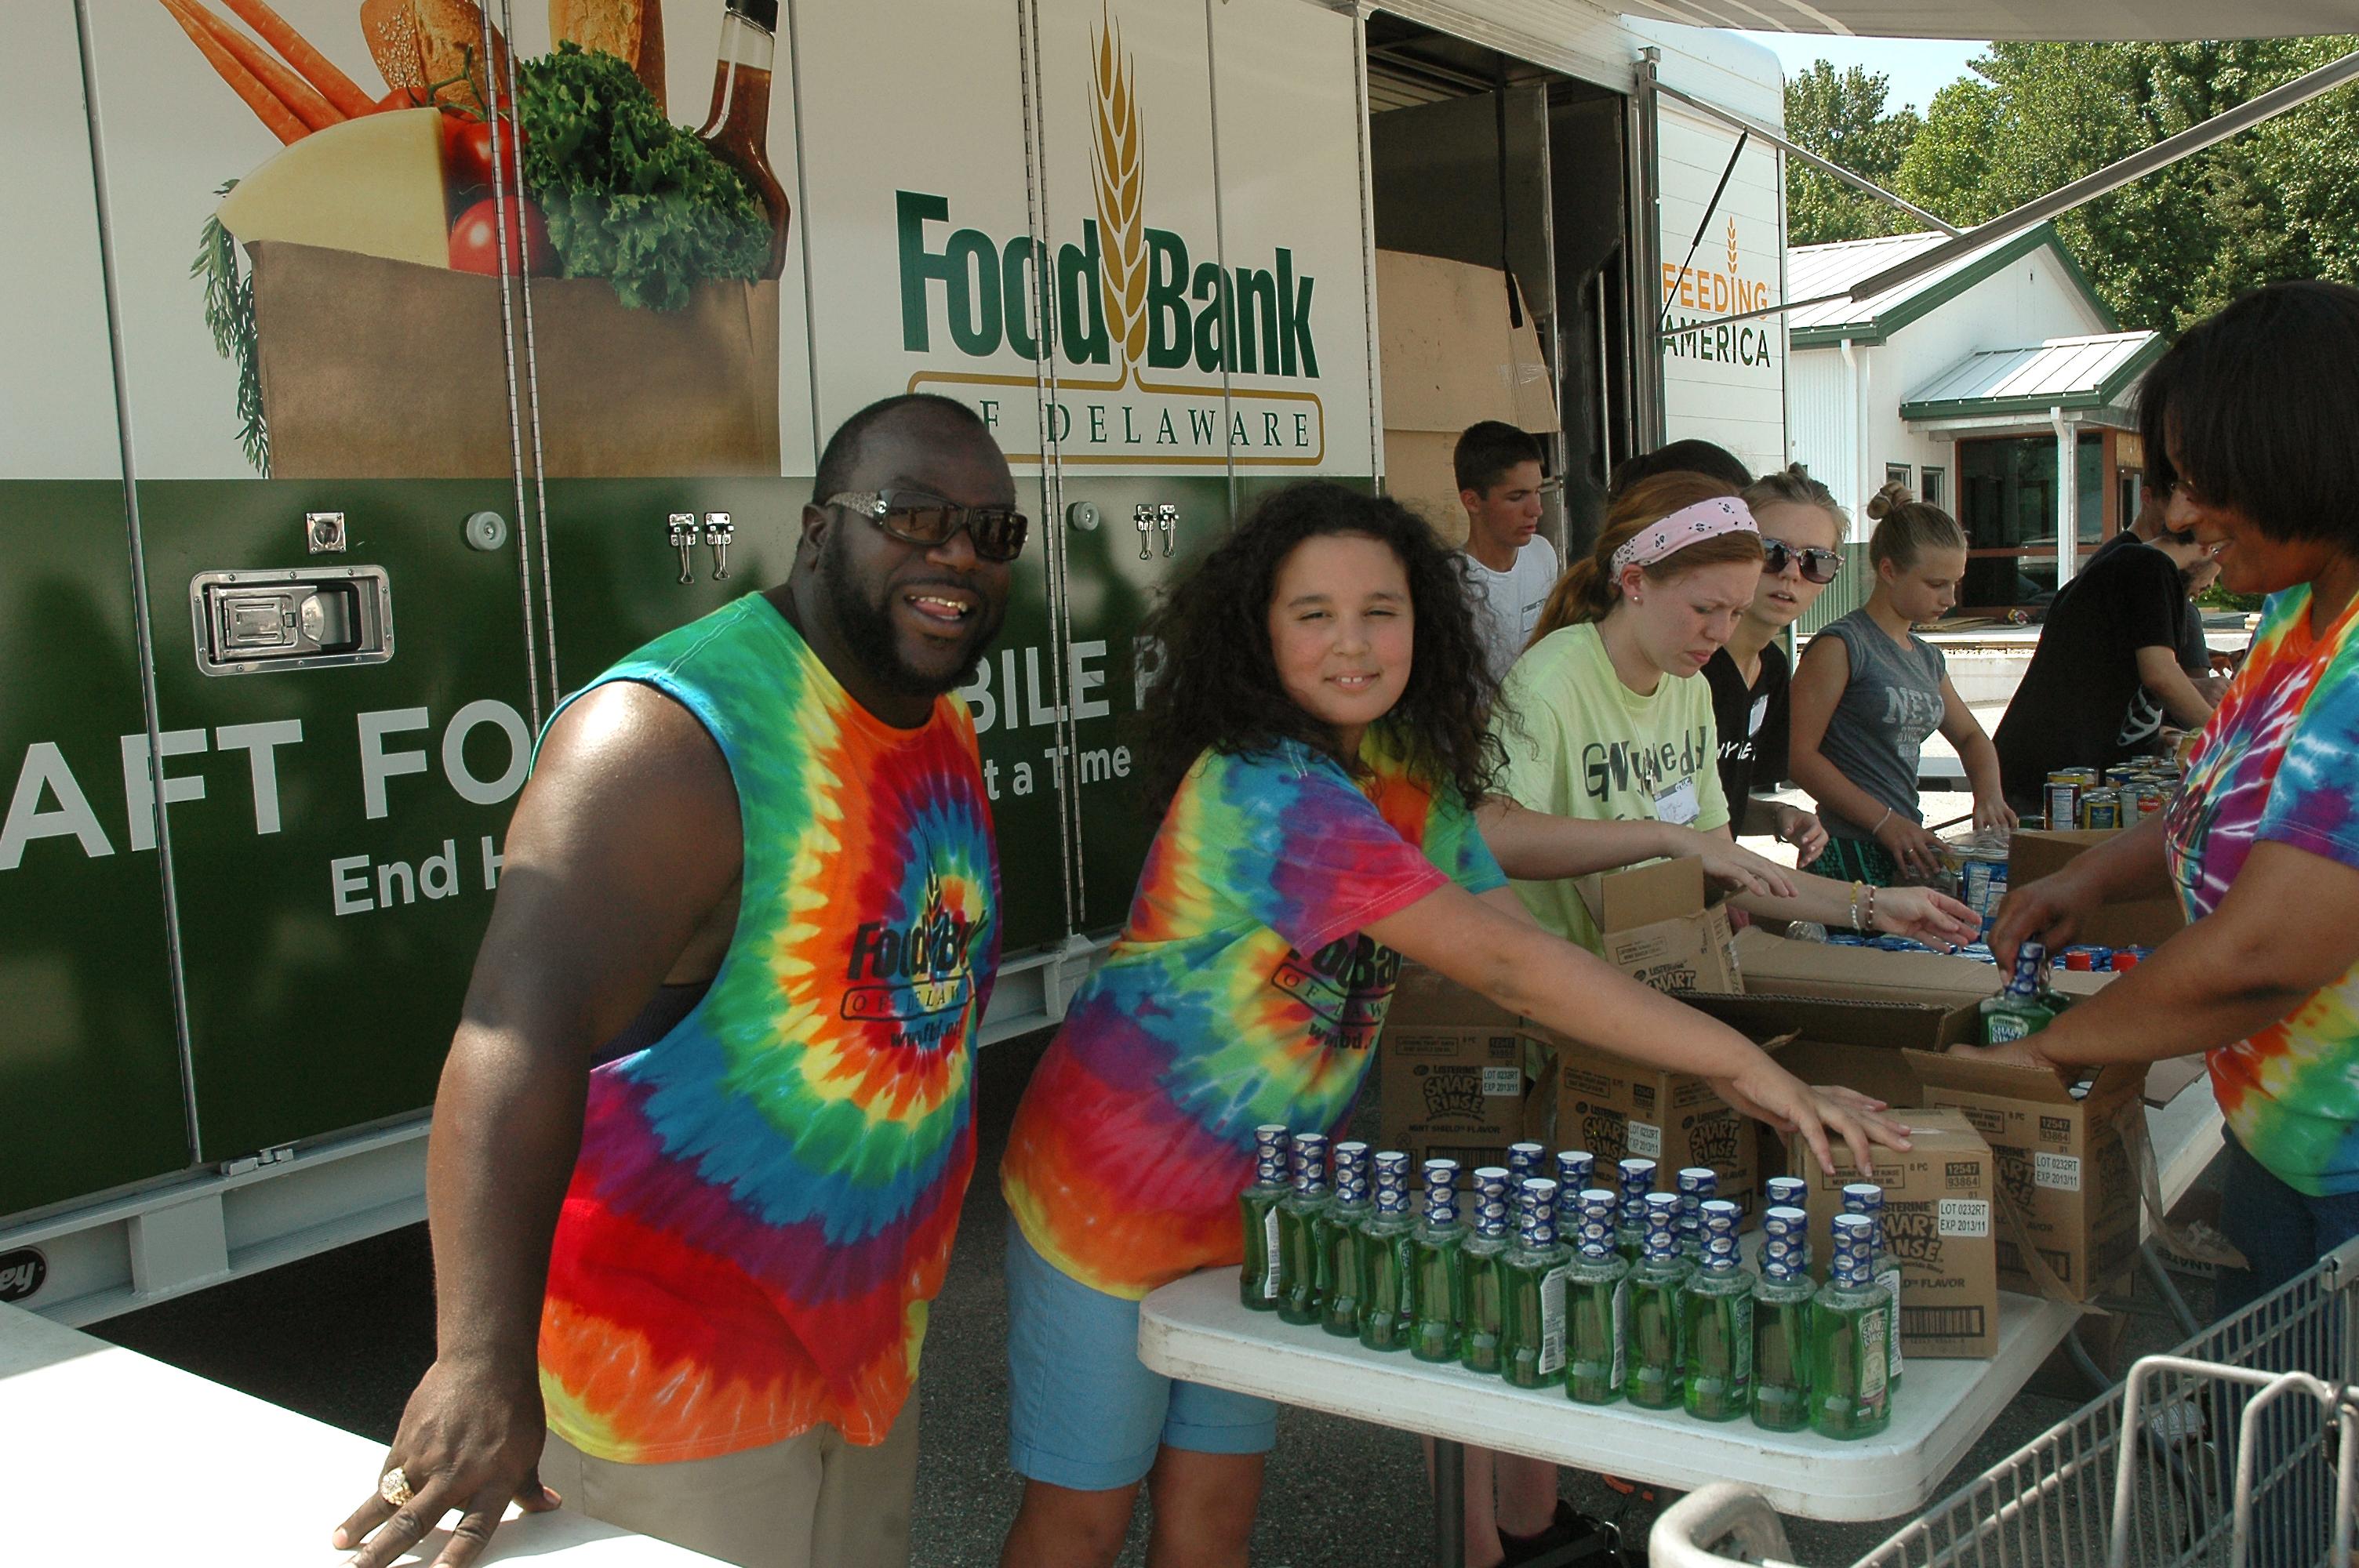 Food Bank Delaware Budget